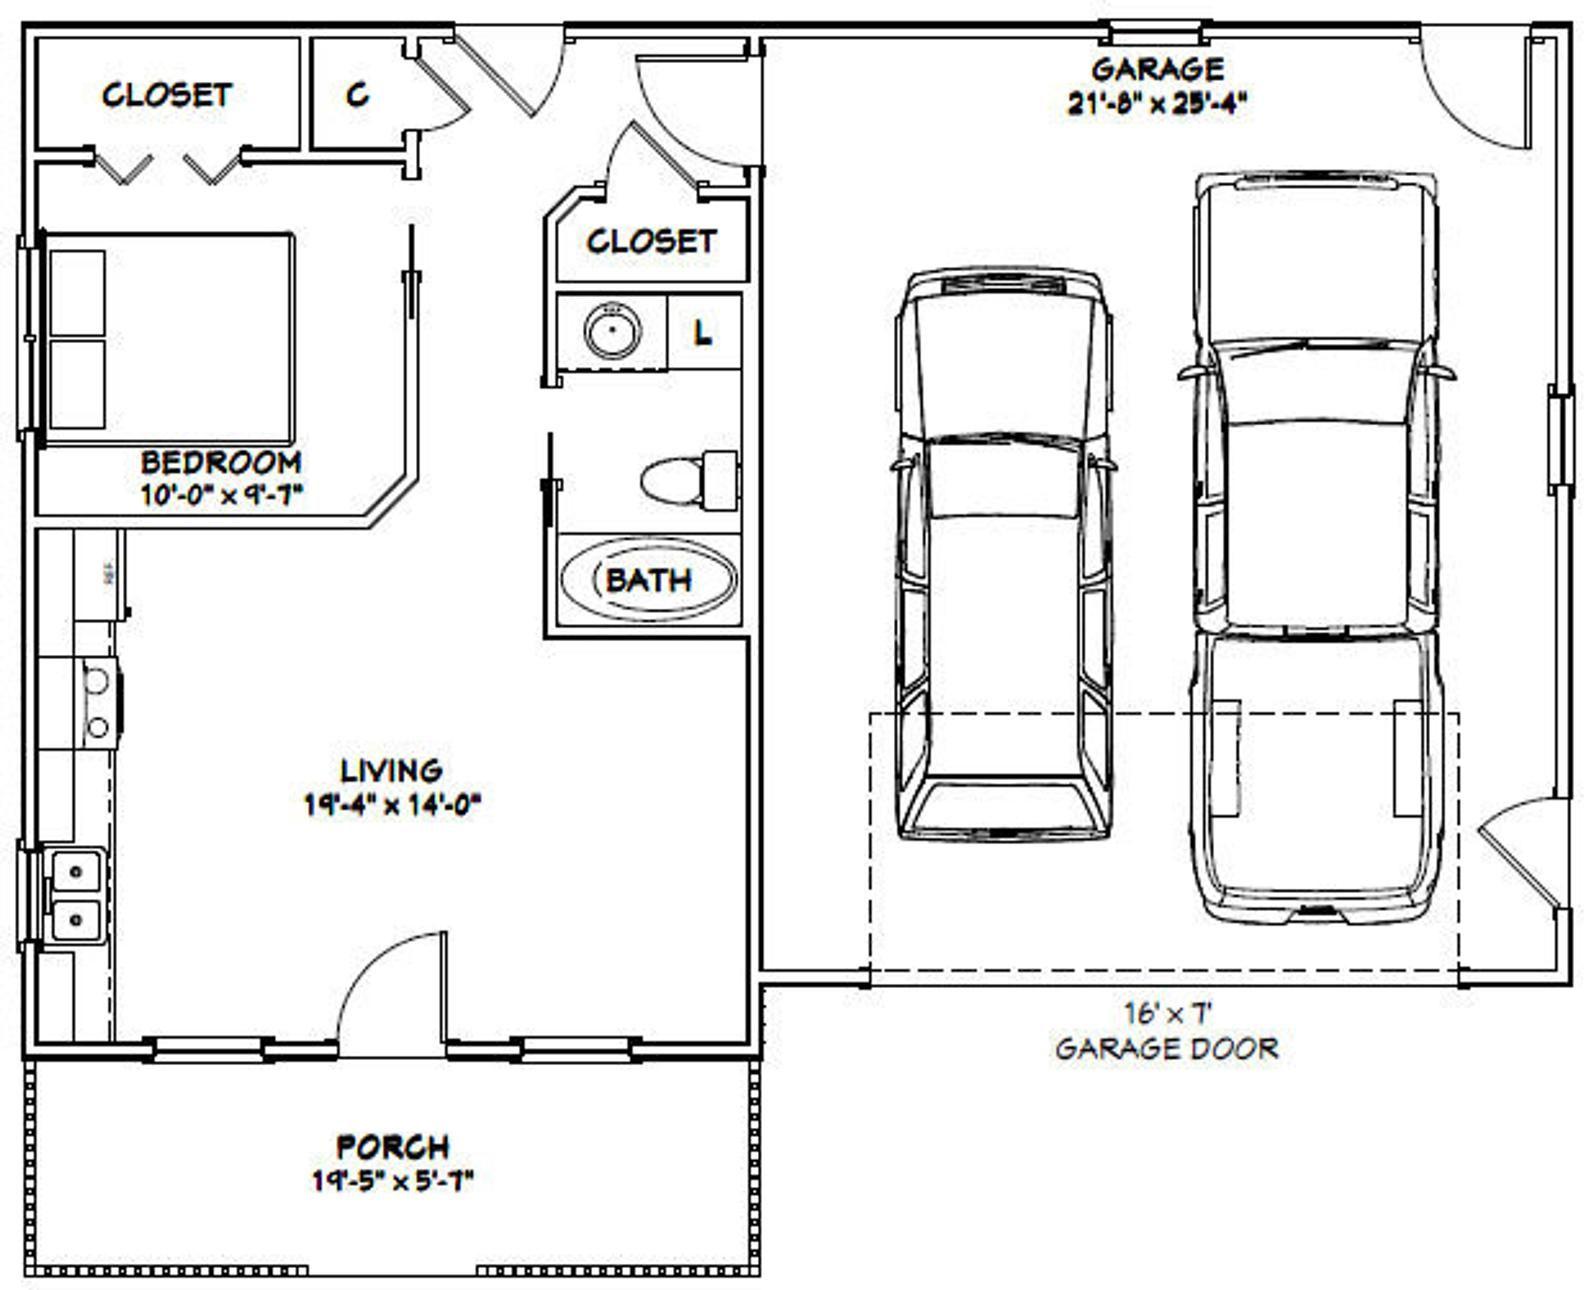 42x28 2 Car Garage 1130 Sq Ft Pdf Floor Plan Instant Etsy In 2021 Garage Apartment Floor Plans Garage Plans With Loft Garage Plans Detached